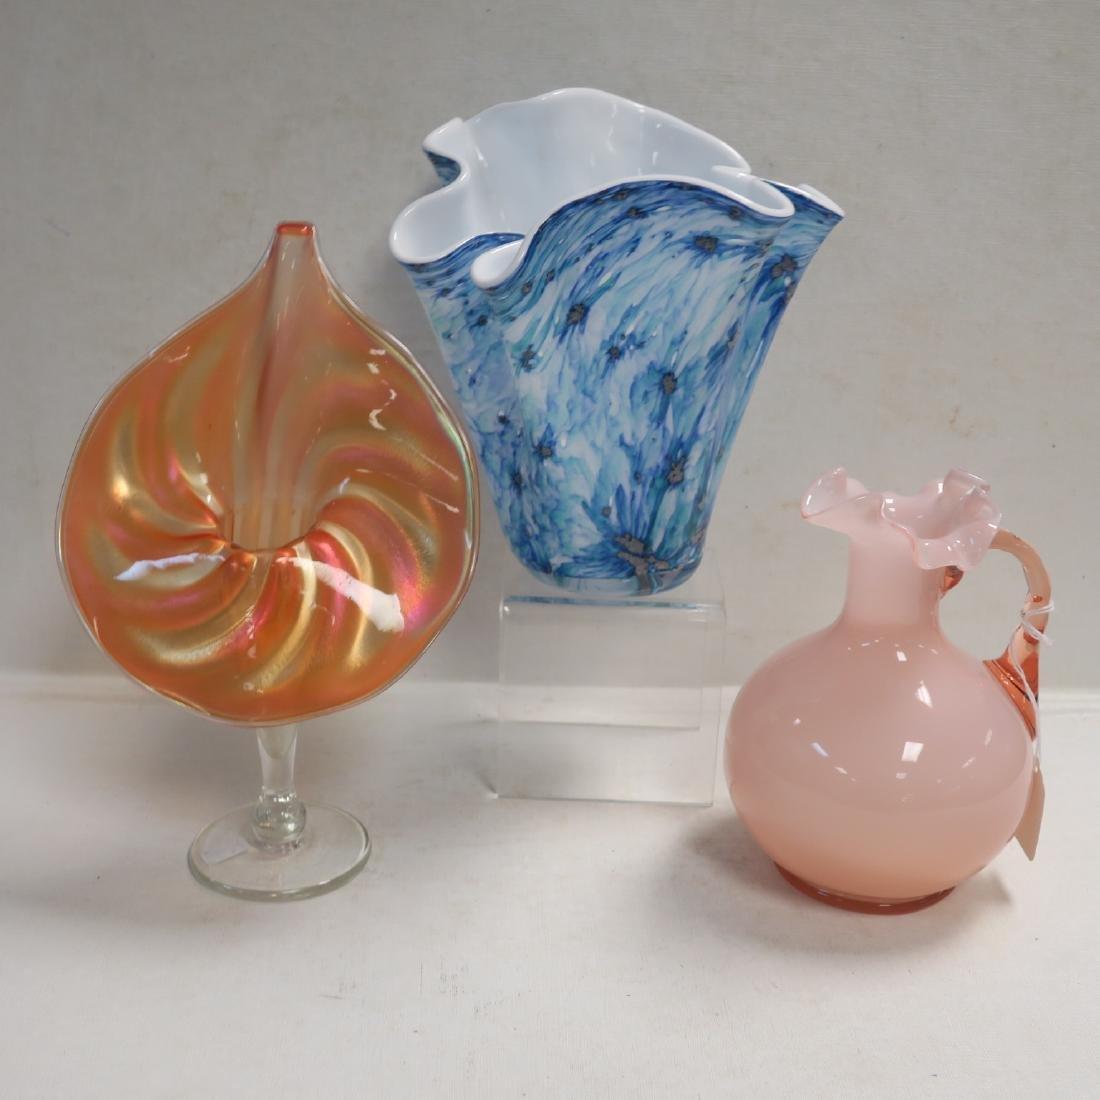 Jack in the Pulpit, Ruffle Pitcher, Handkerchief Vase: